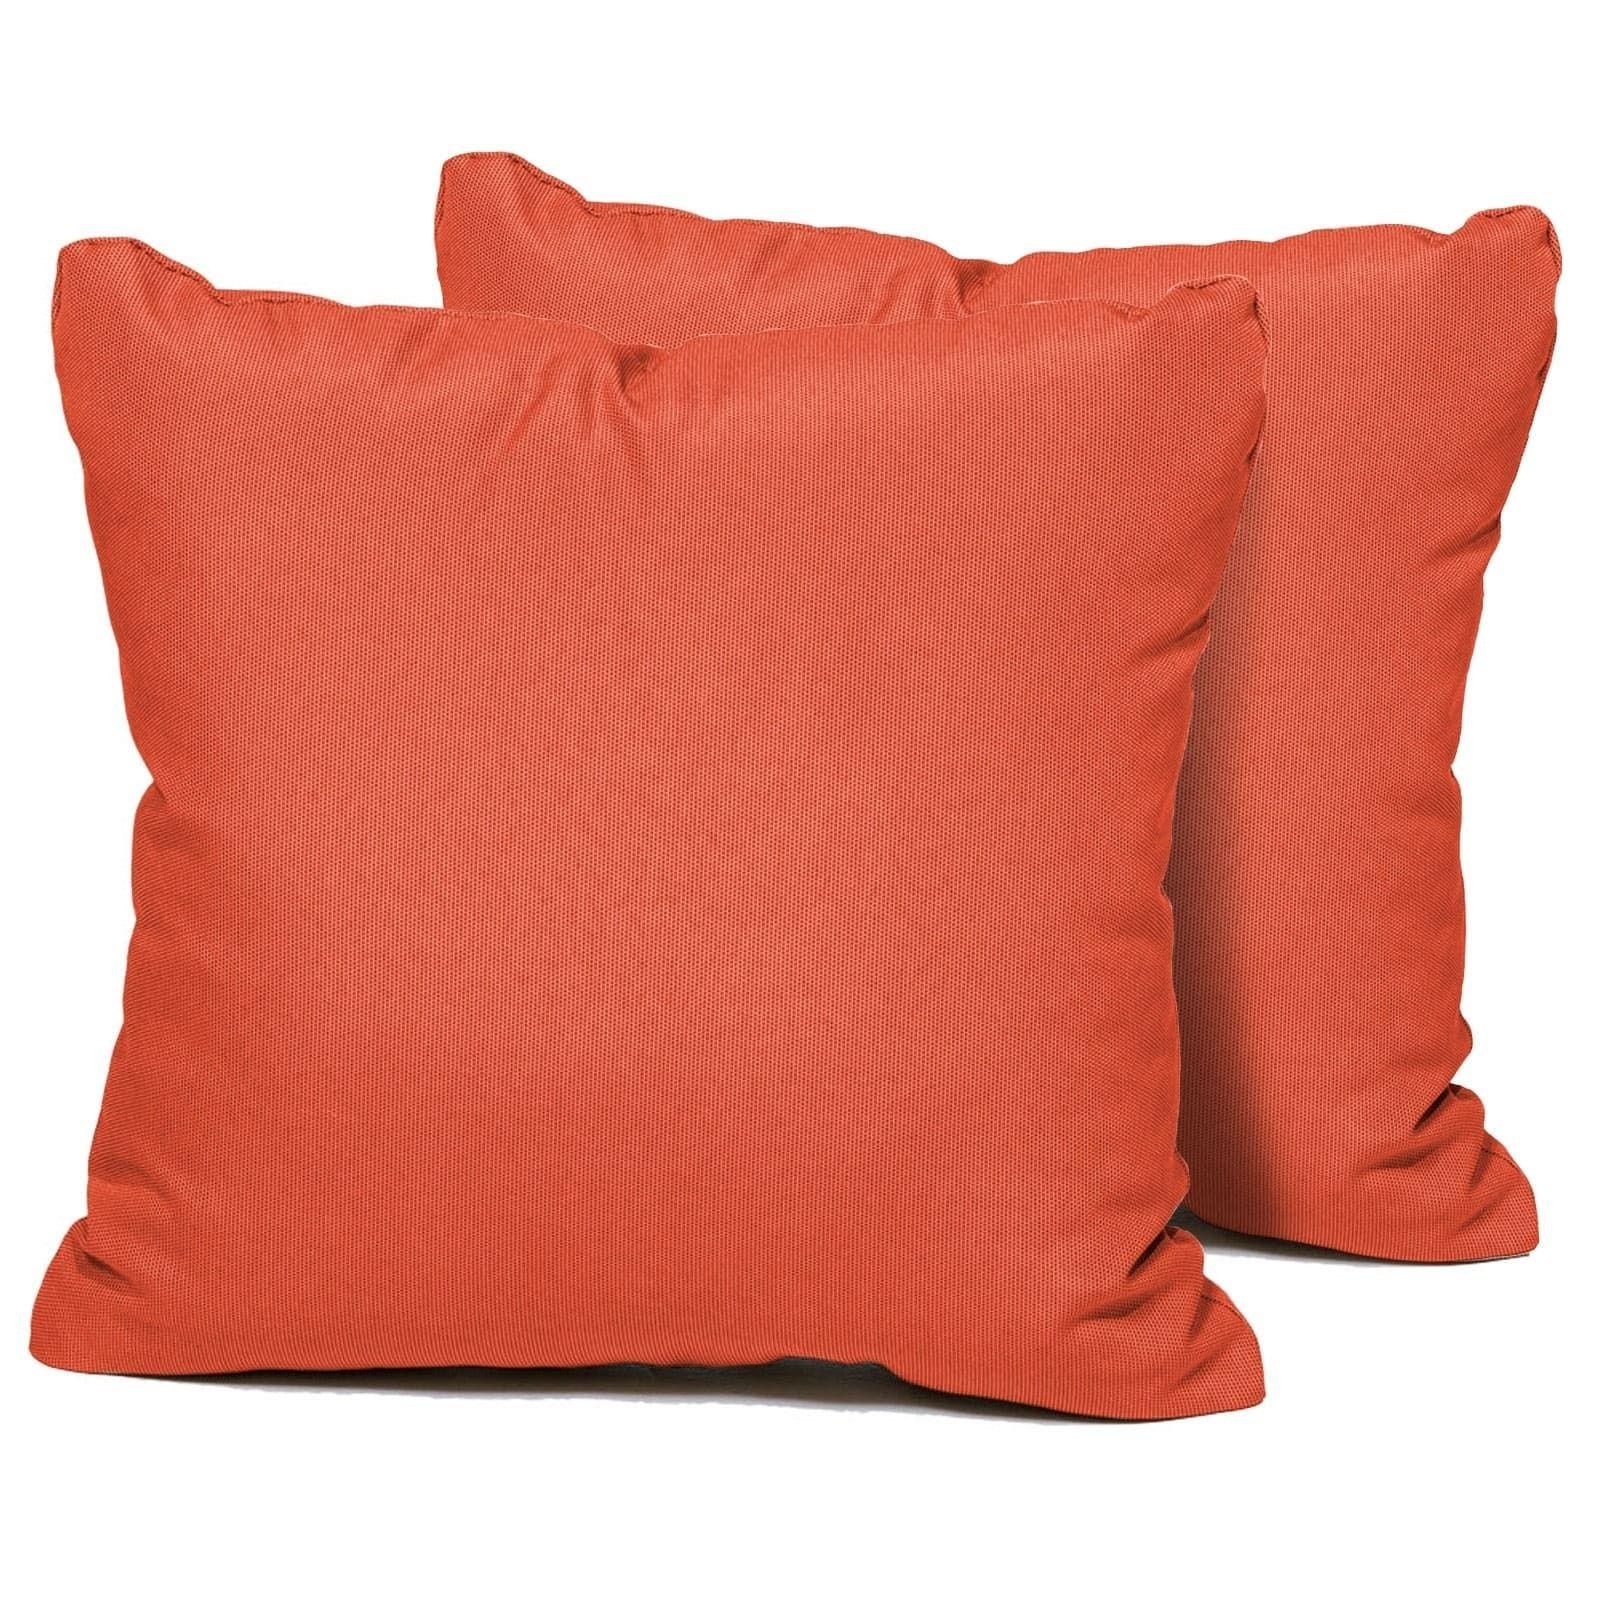 Tangerine Outdoor Throw Pillows Square Set Of 2 Orange Tk Classics